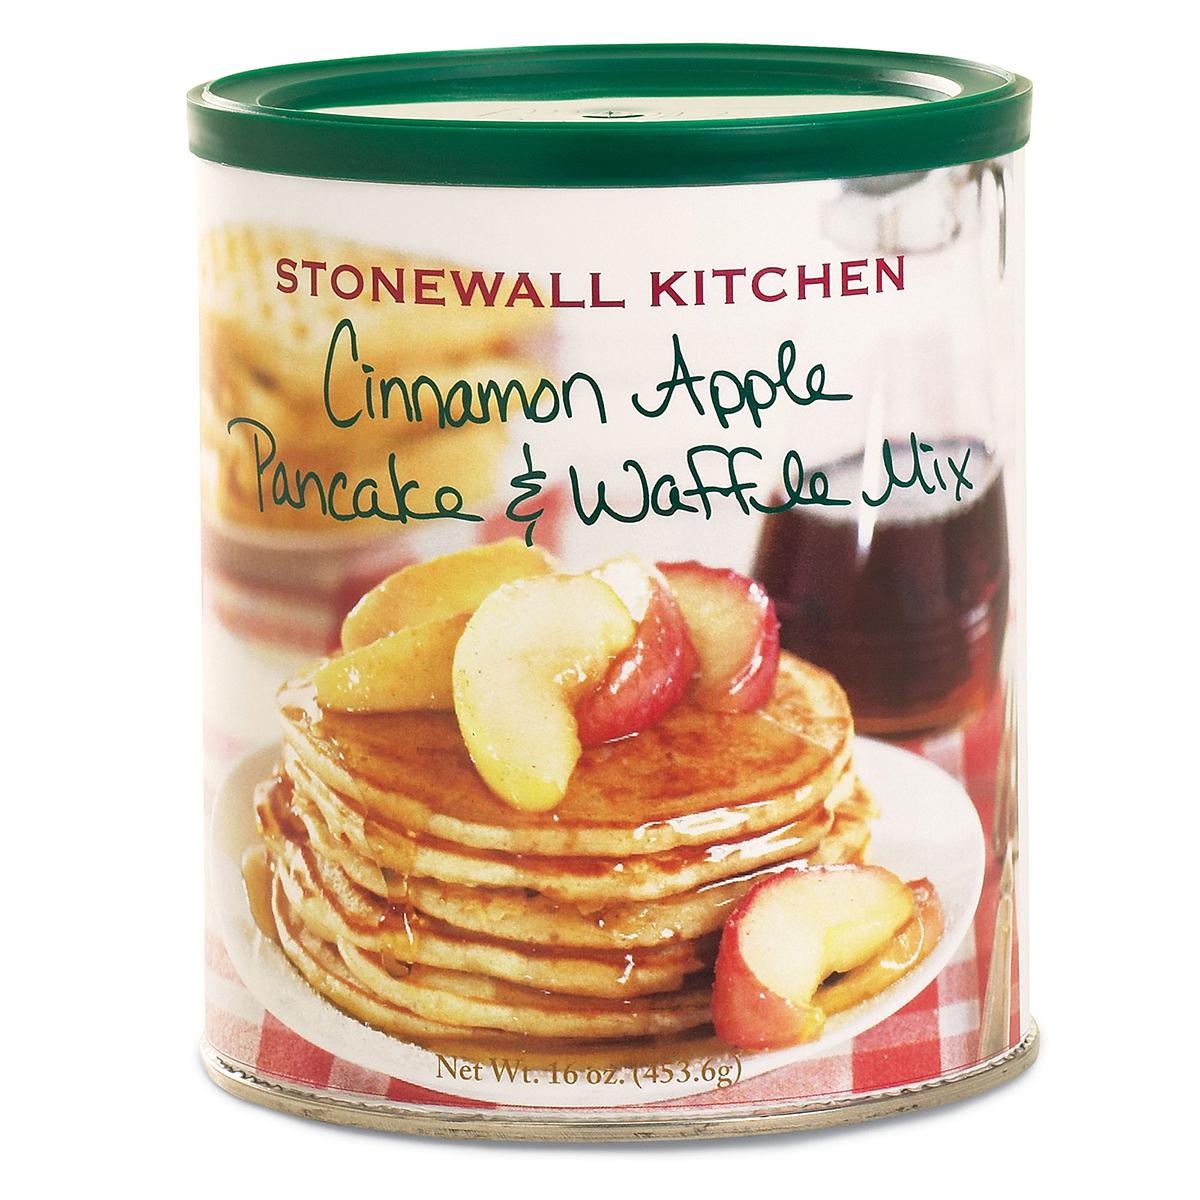 711381025659 UPC - Pancake And Waffle Mix